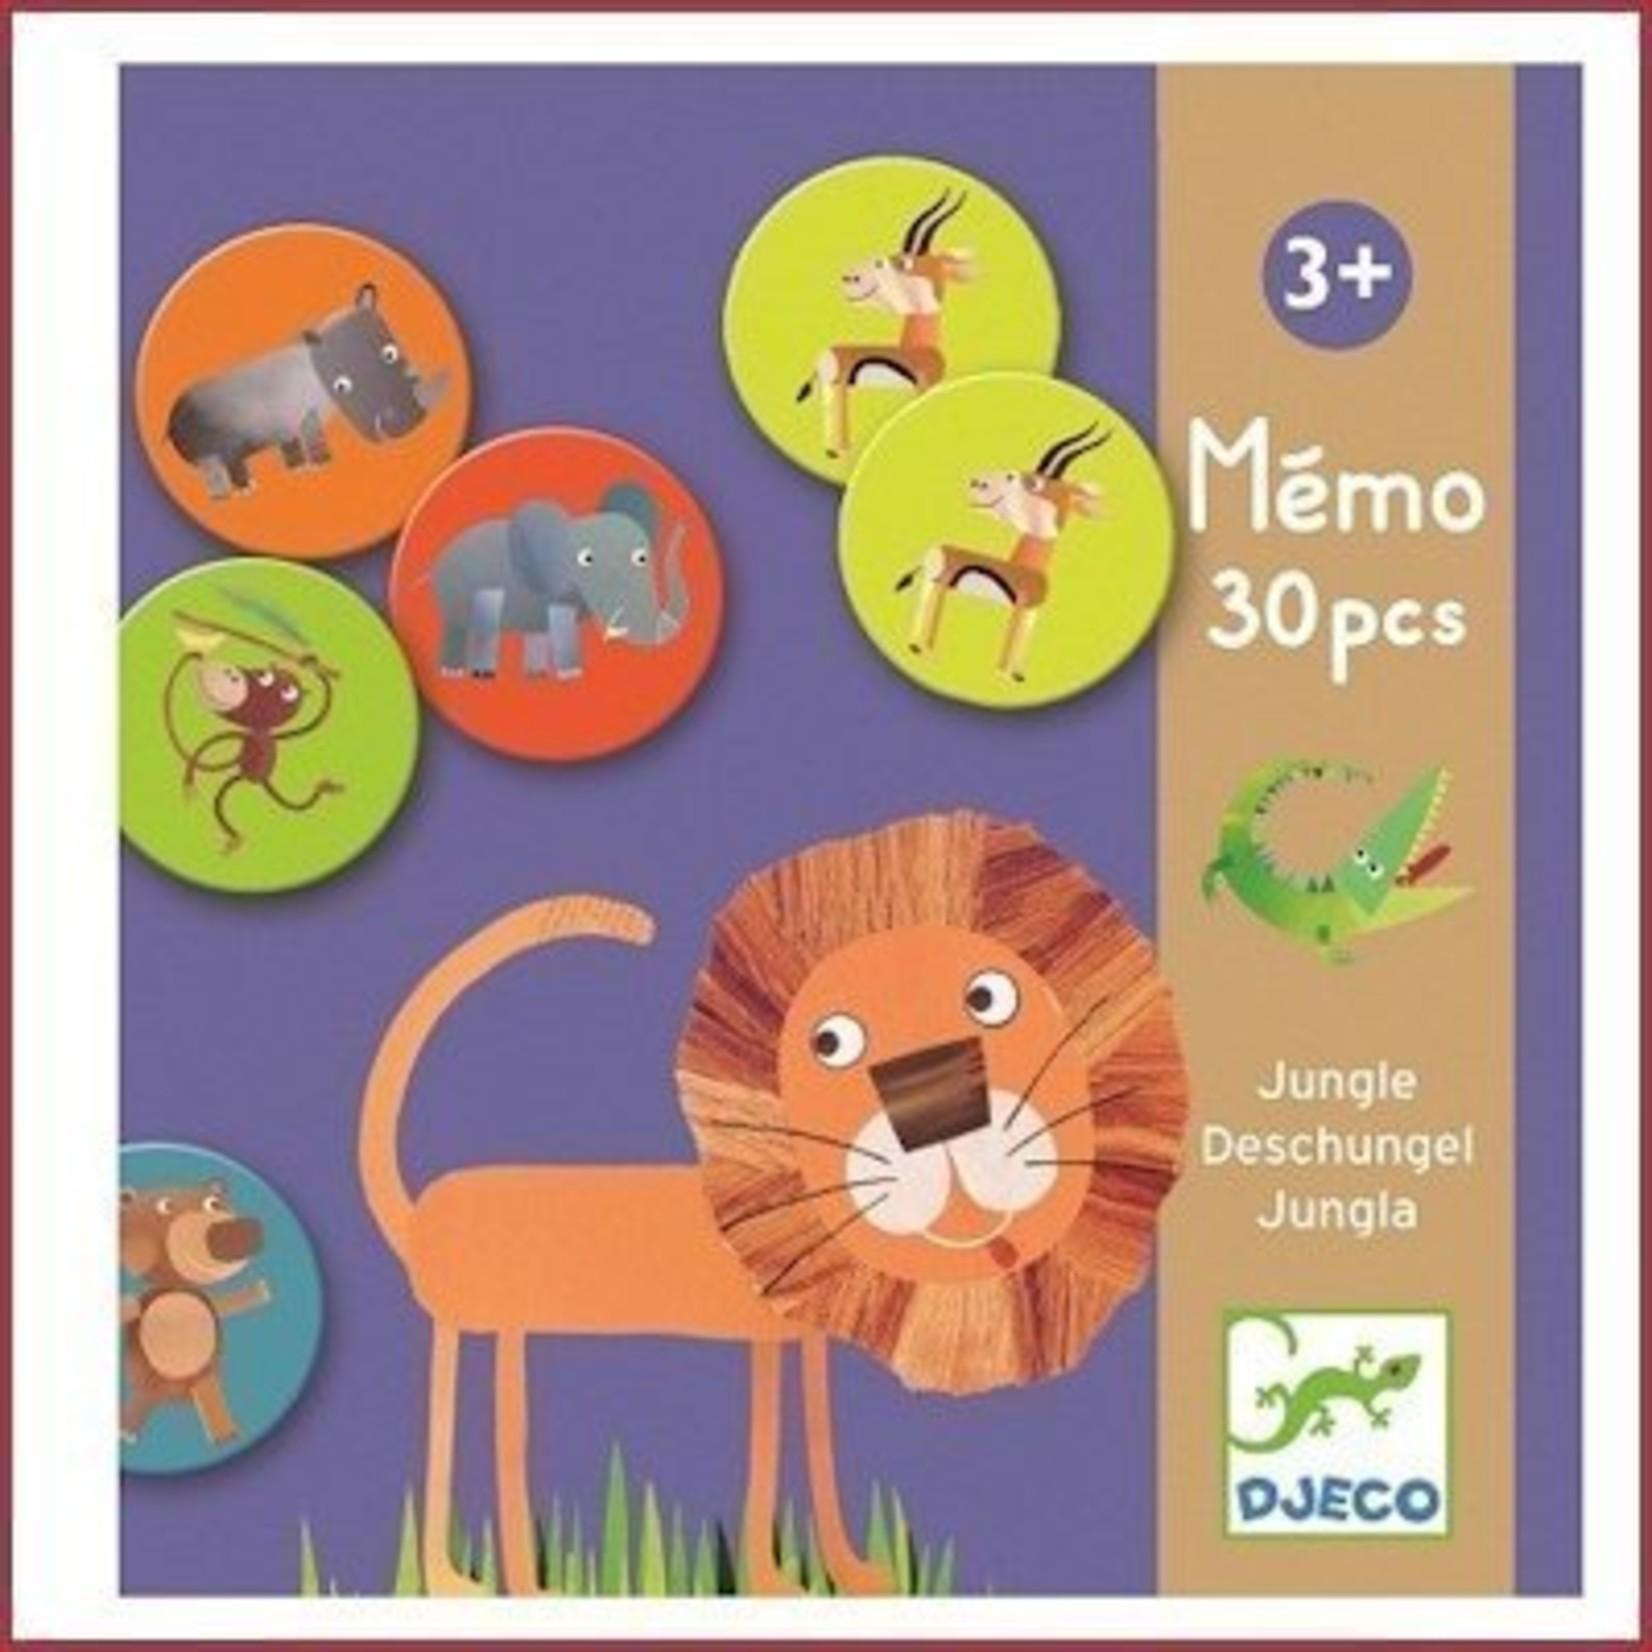 Djeco Memospel Jungle